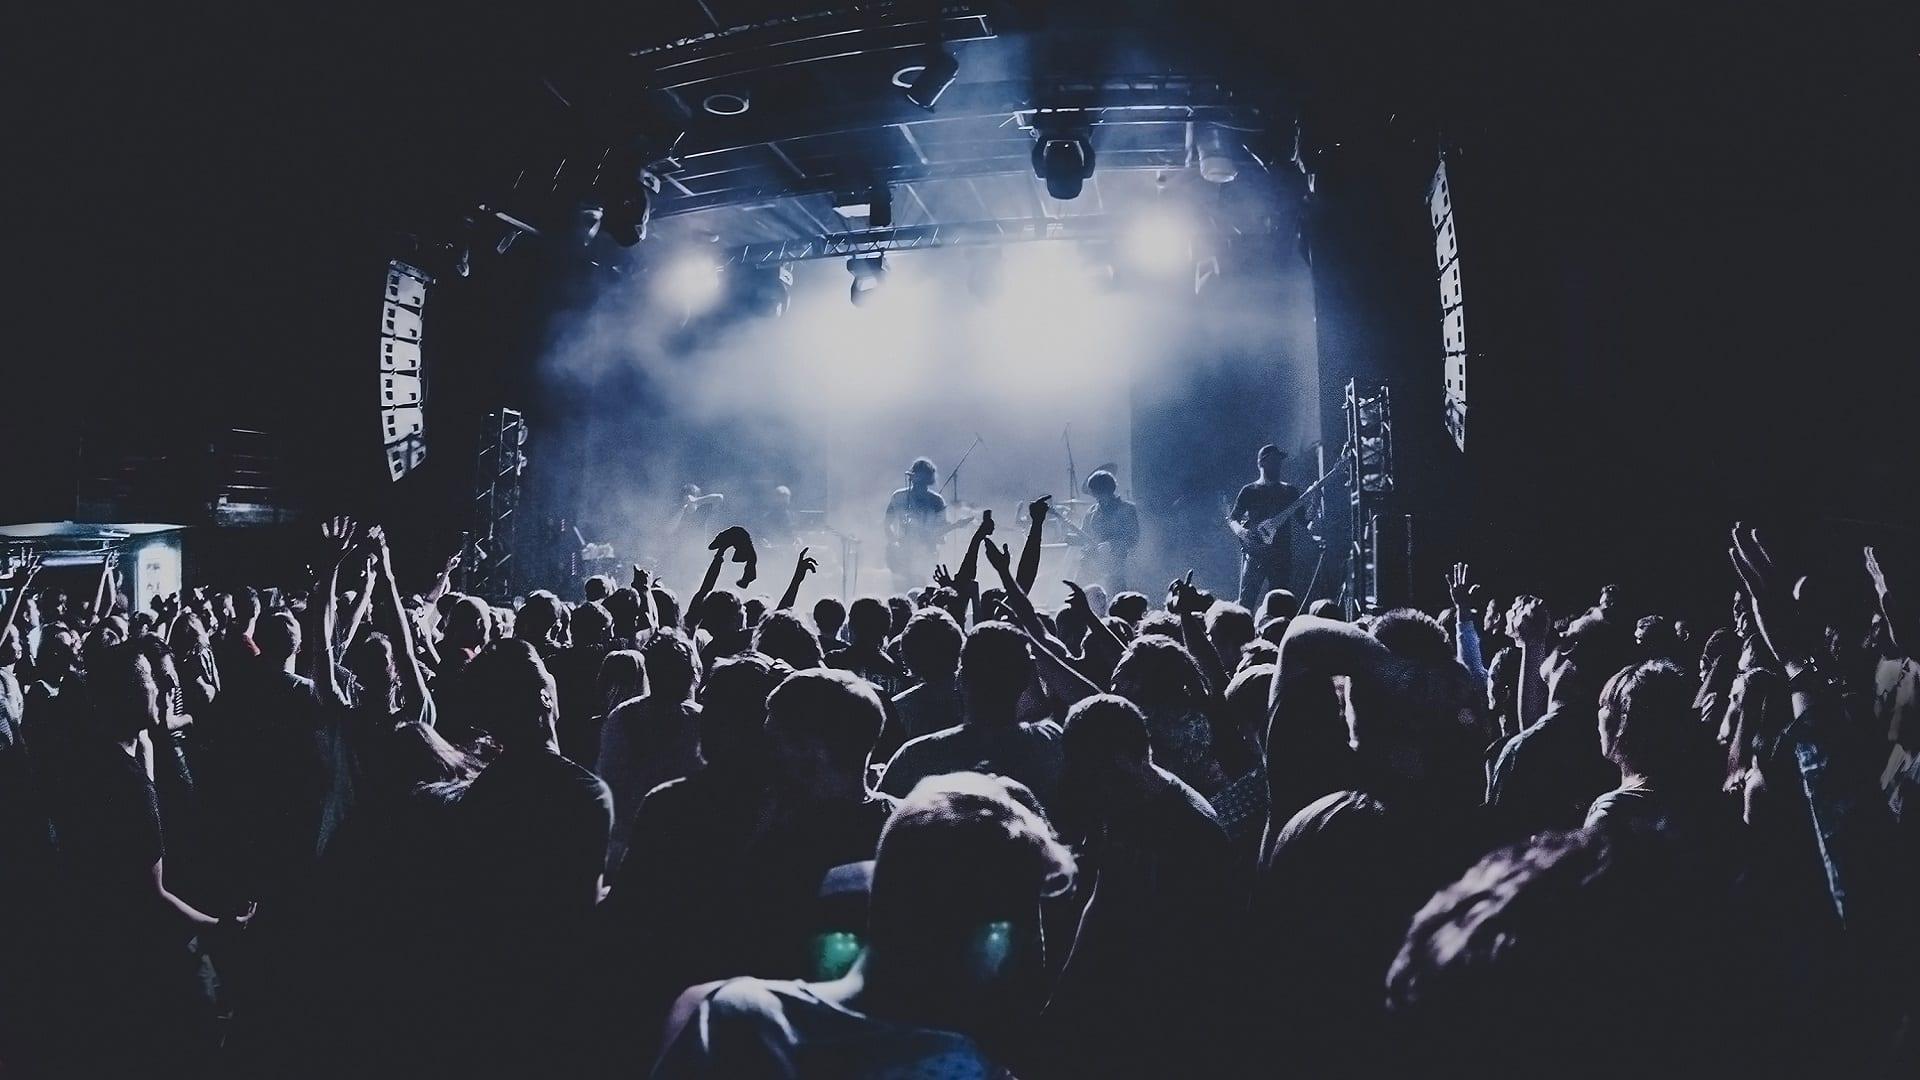 Koncert z tłumem ludzi